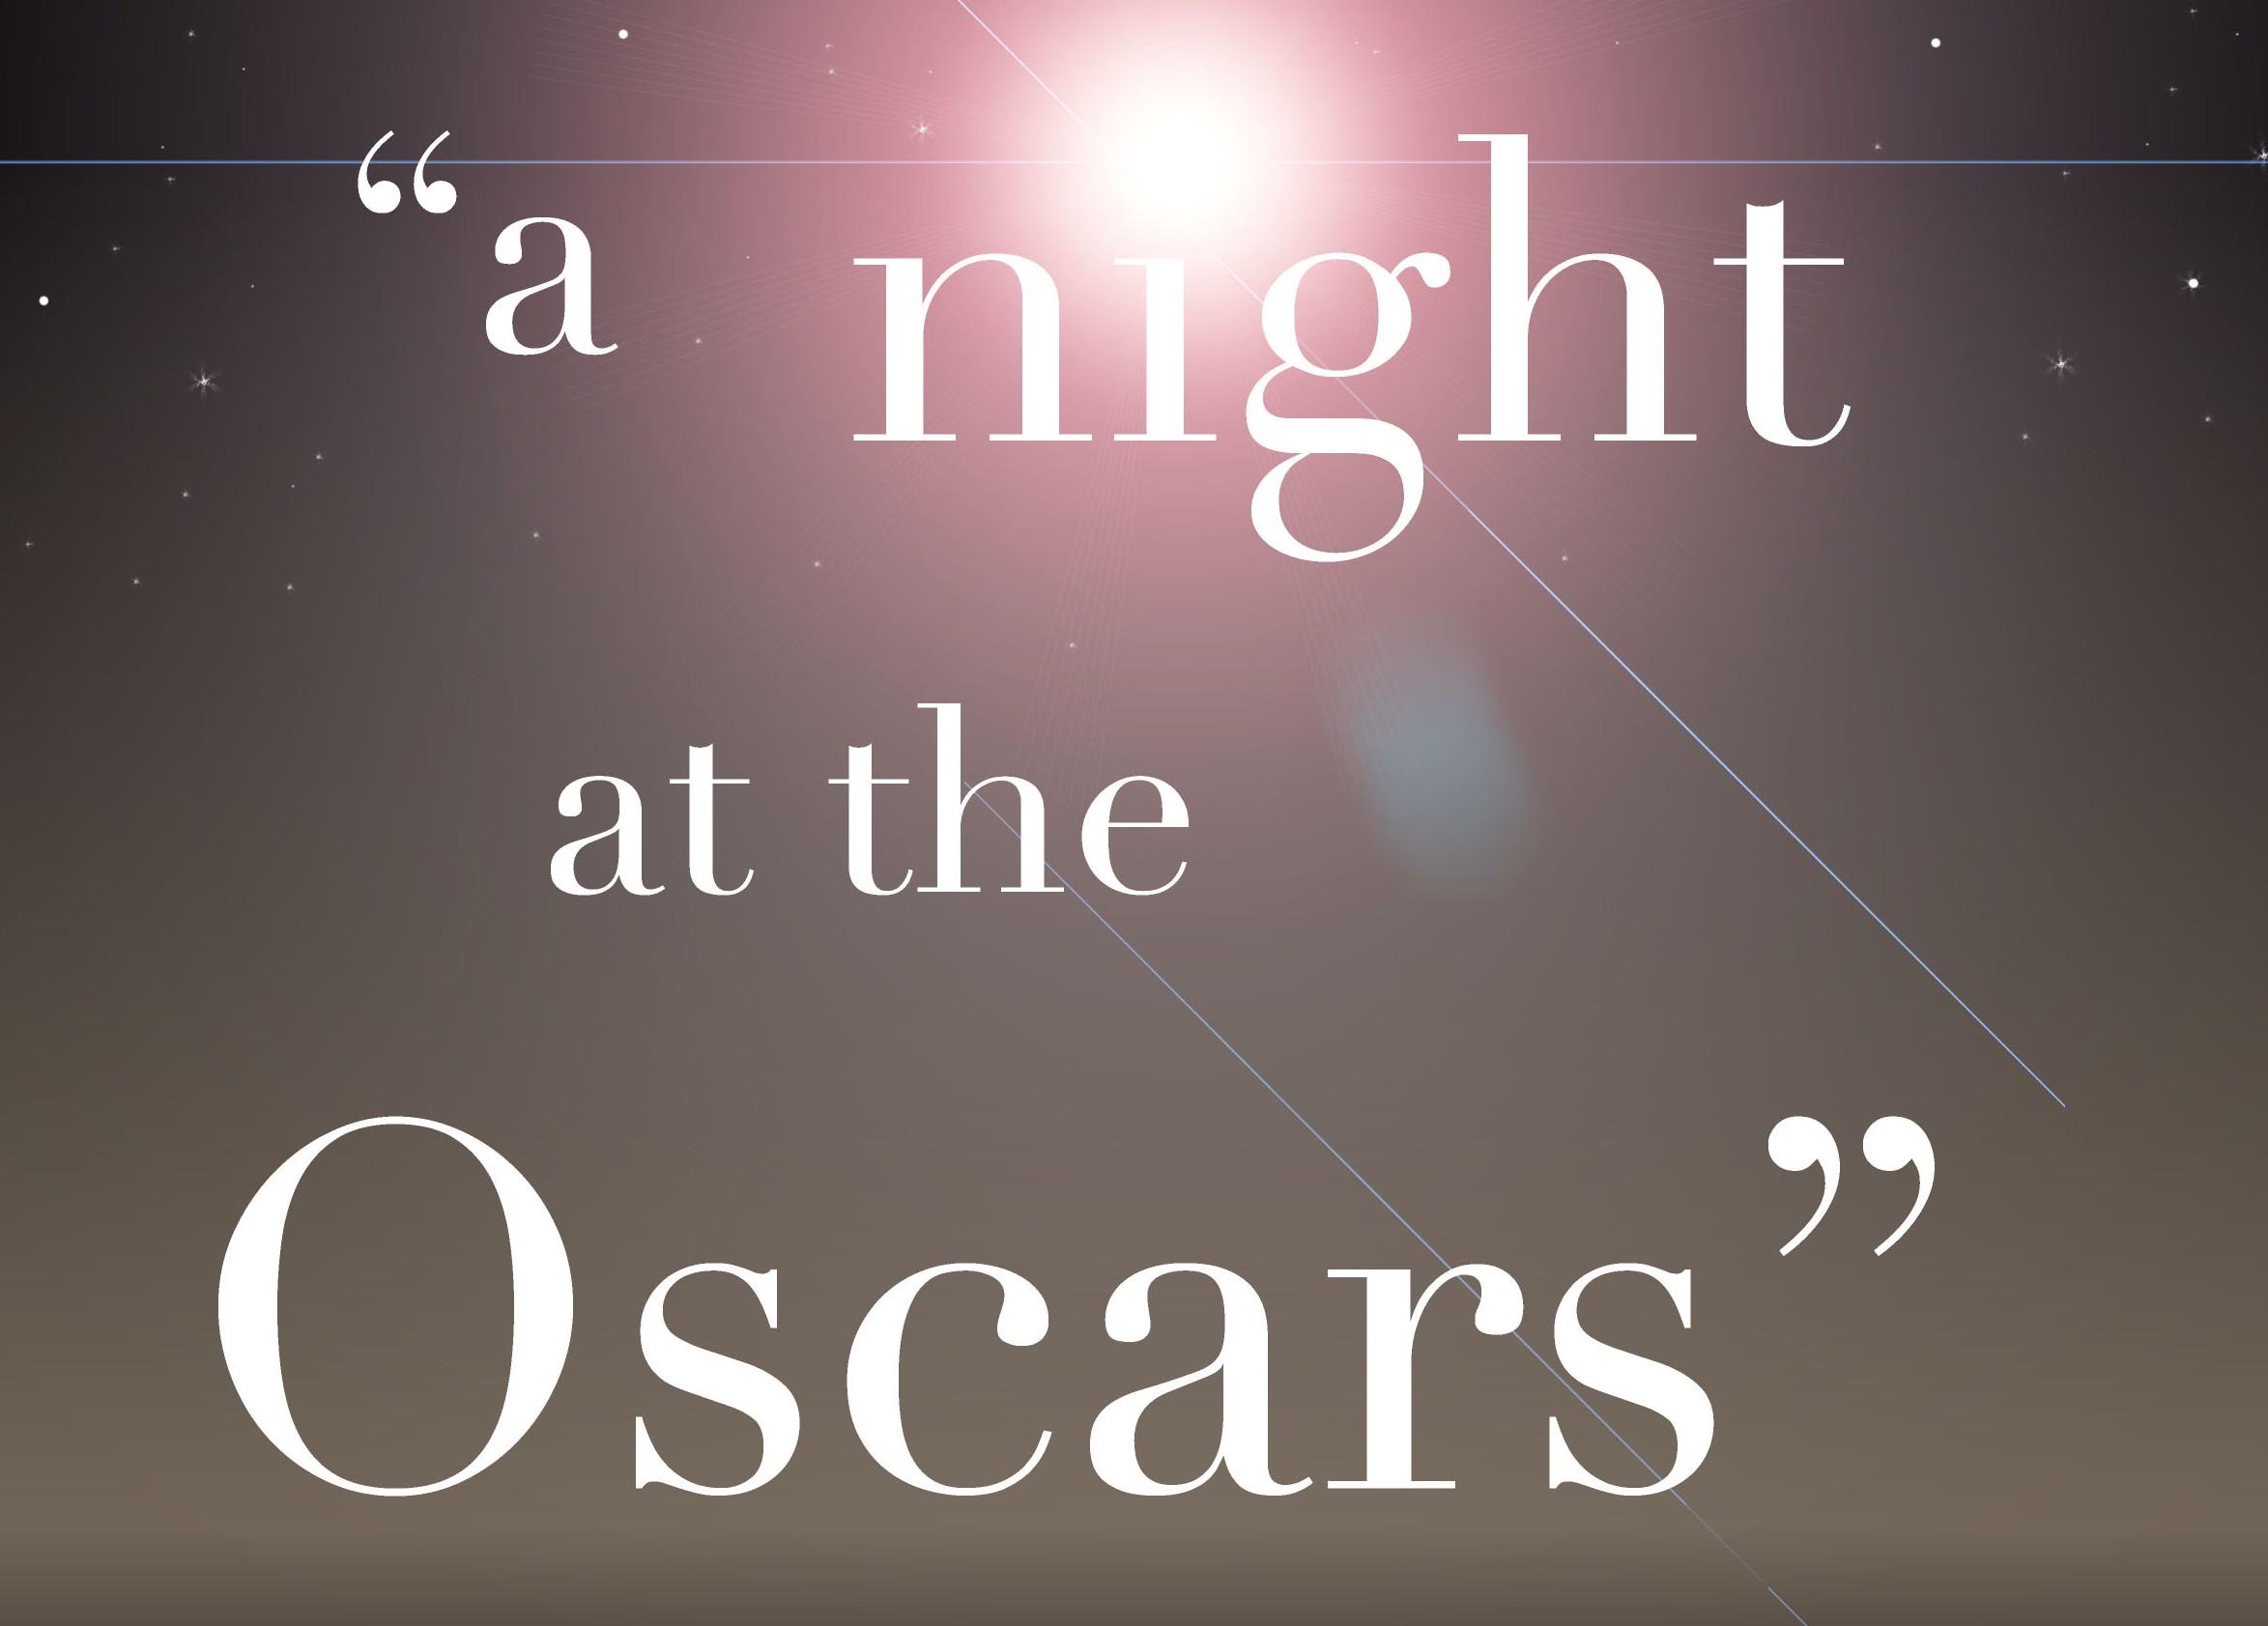 a-night-at-the-oscars